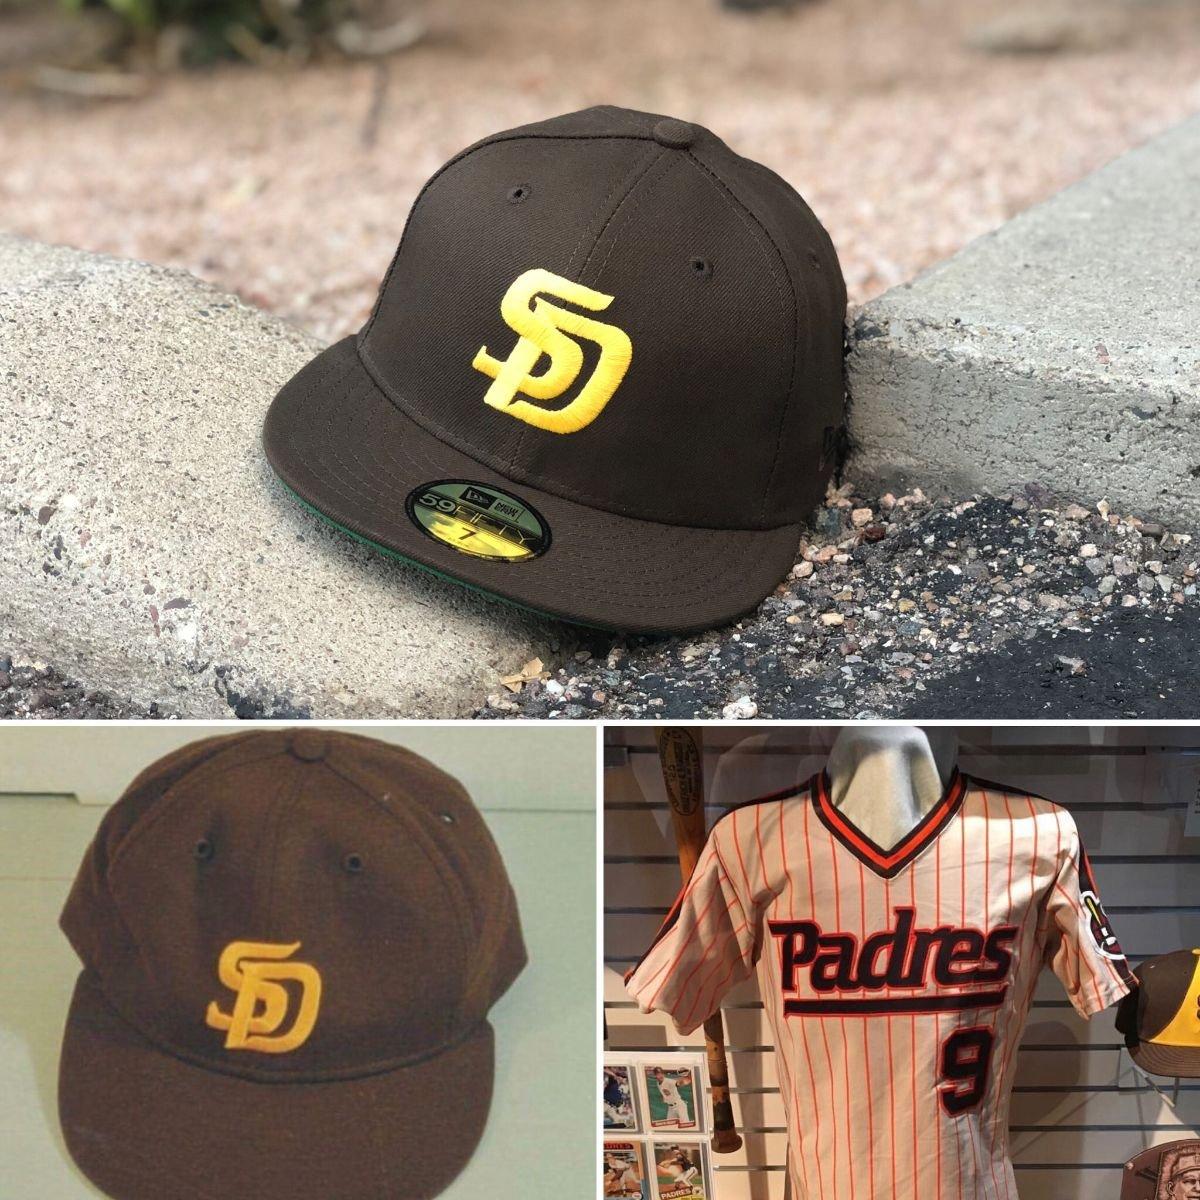 premium selection 9b9ef 9da93 The Padres Hat that never happened...🔥